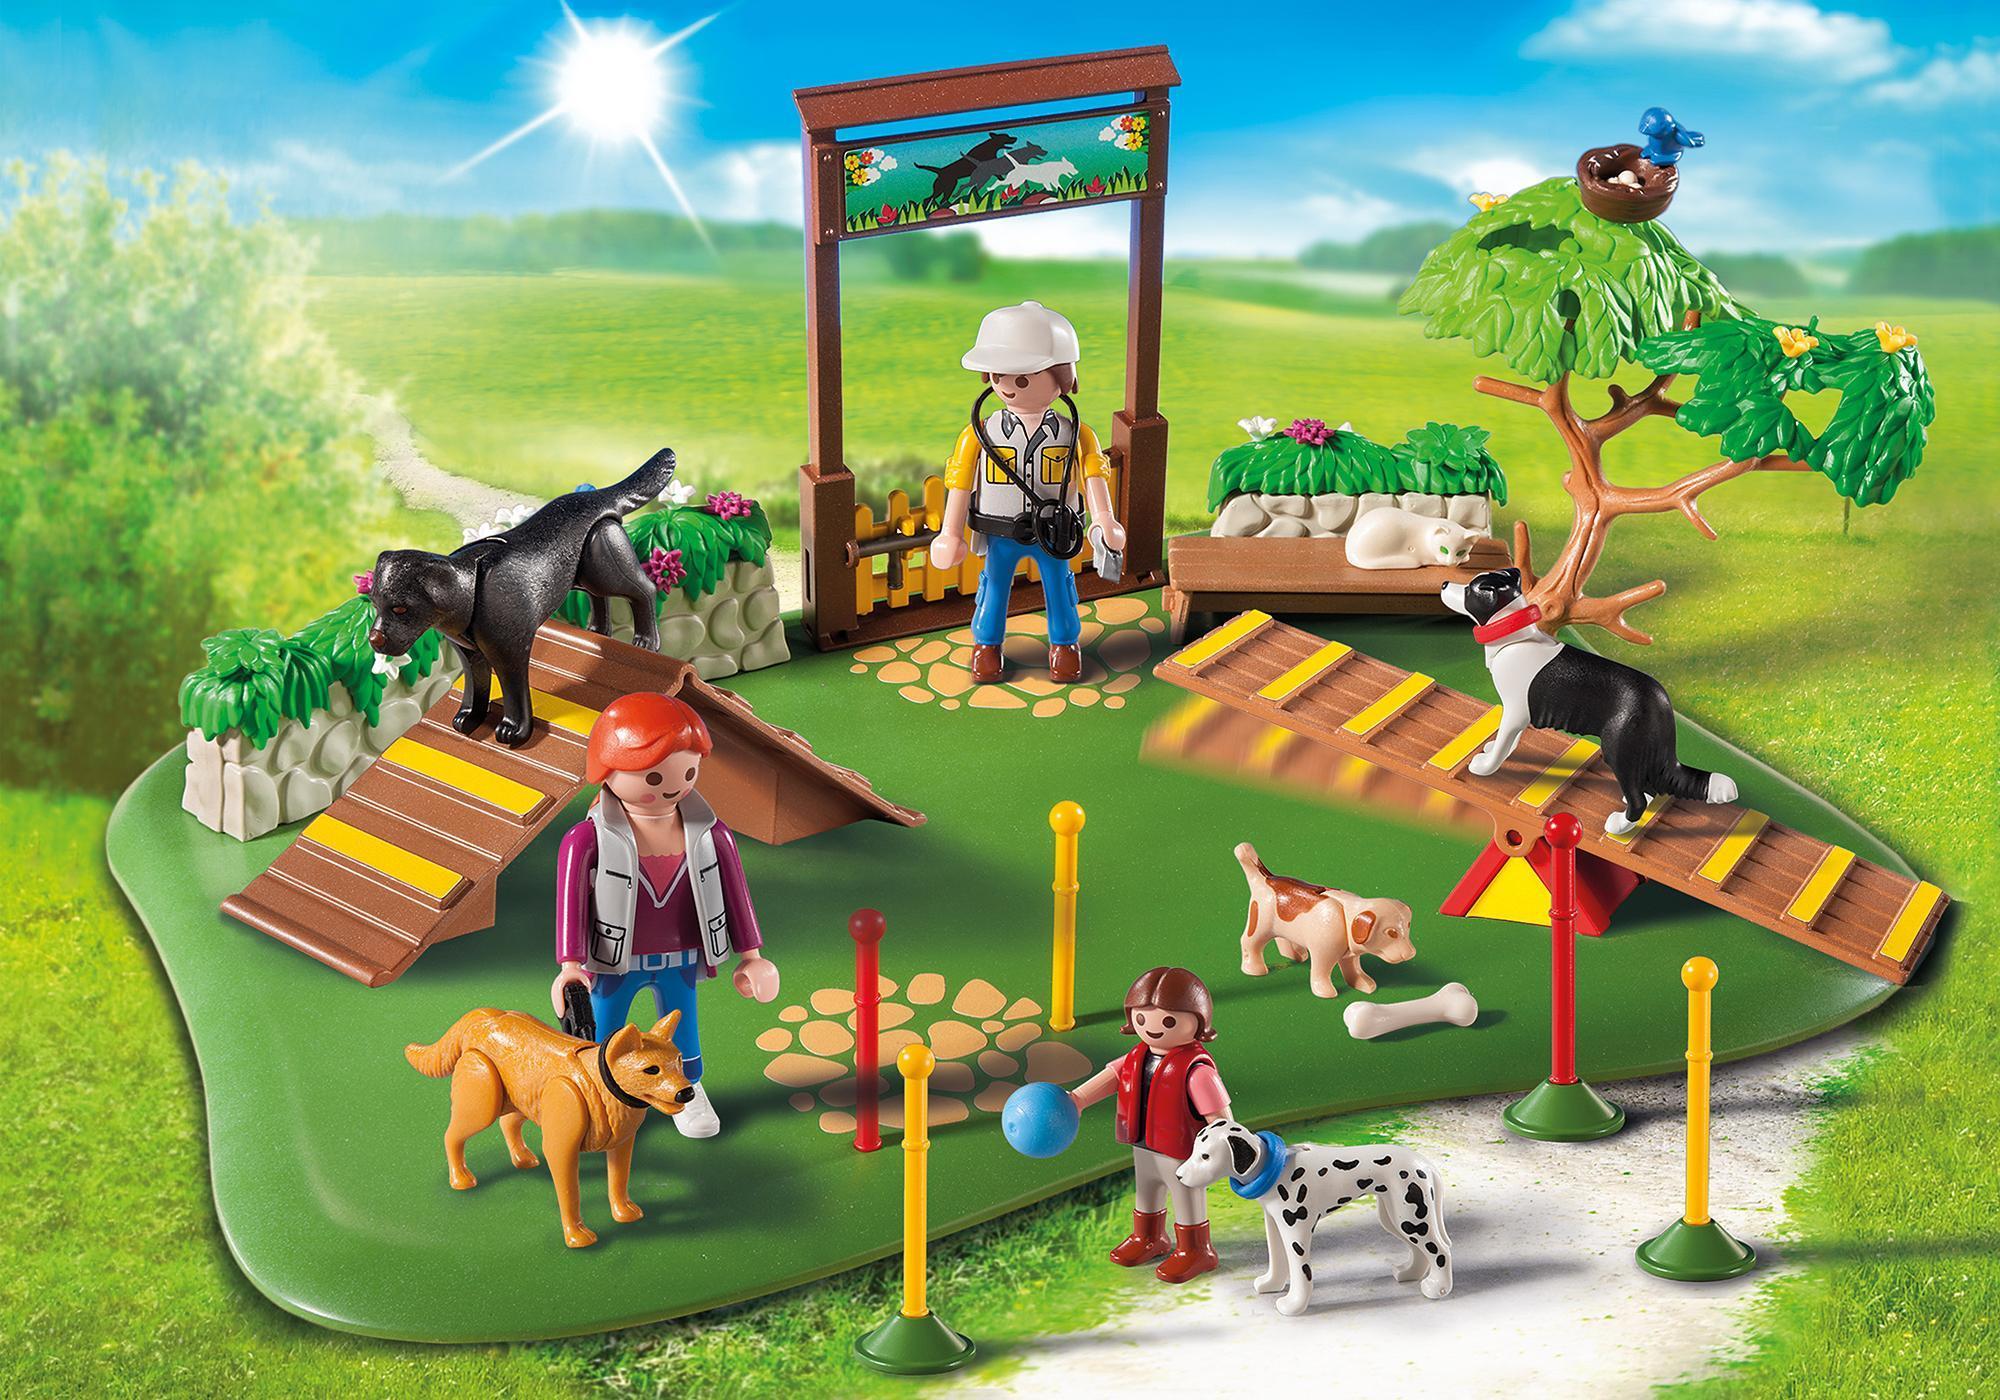 http://media.playmobil.com/i/playmobil/6145_product_detail/SuperSet Hundeschule